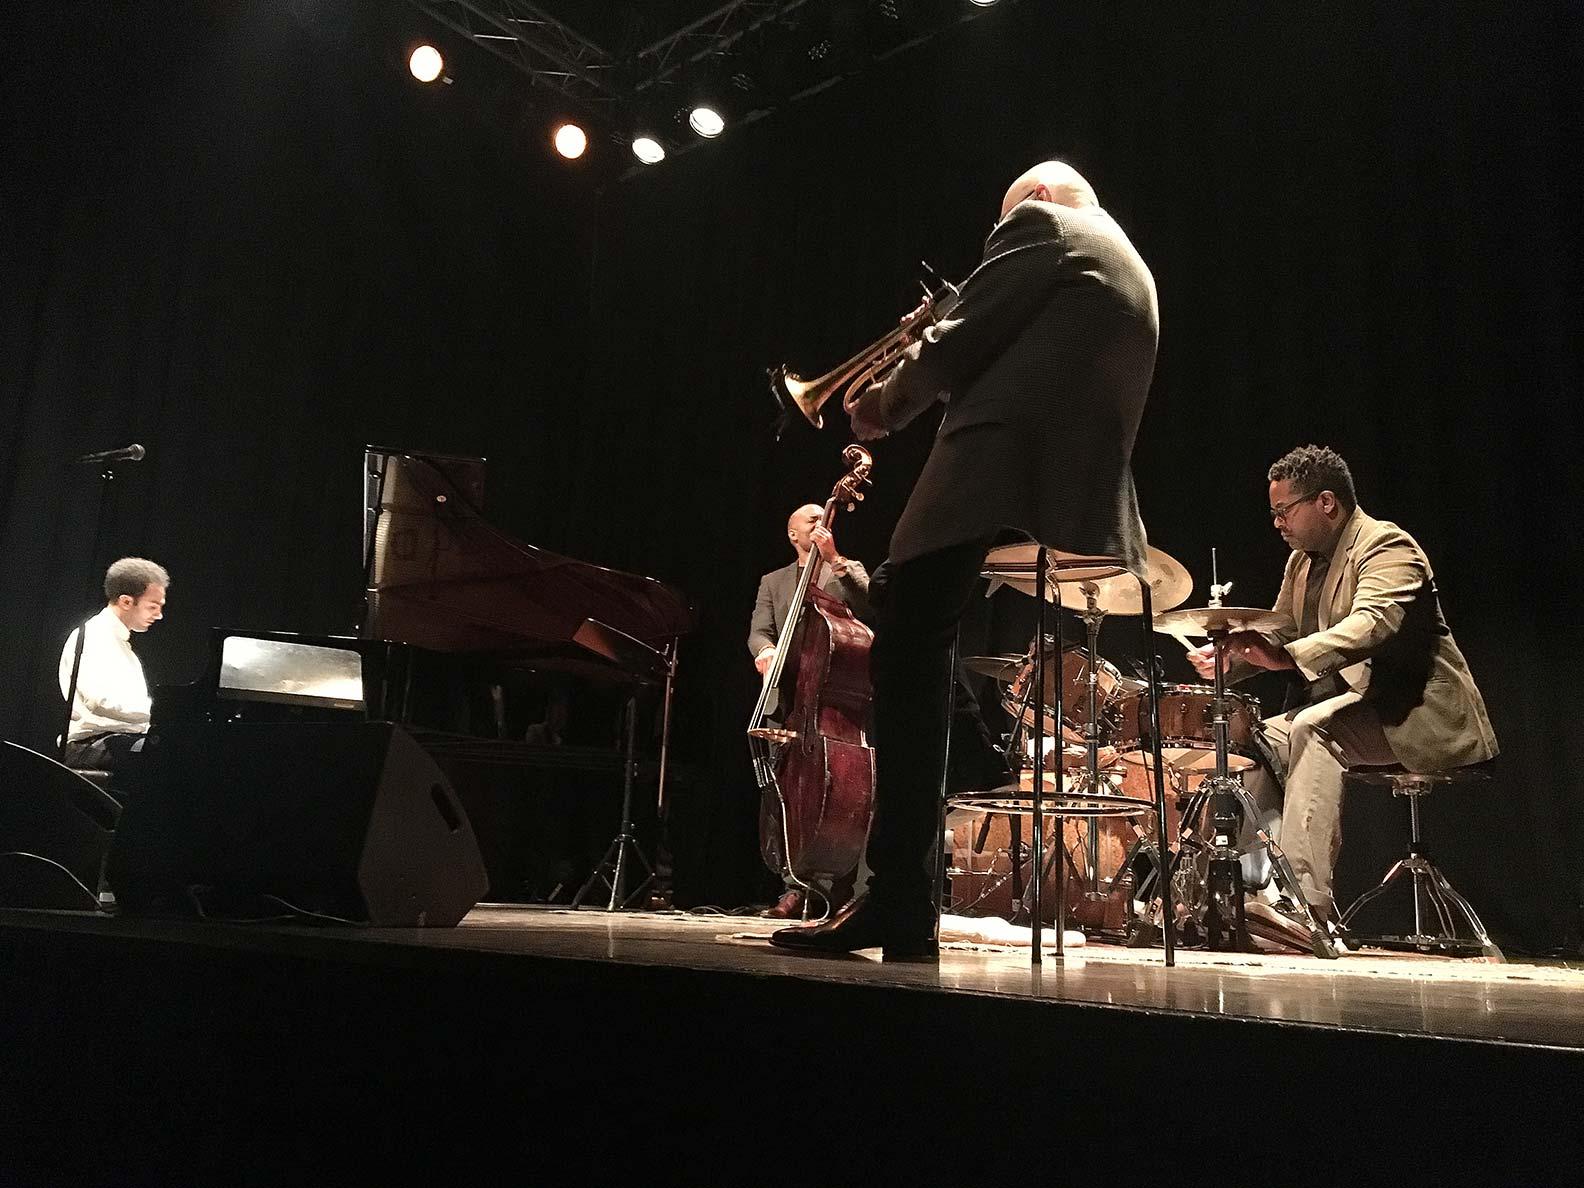 Stanko-Stage-Oslo--9.4.2016